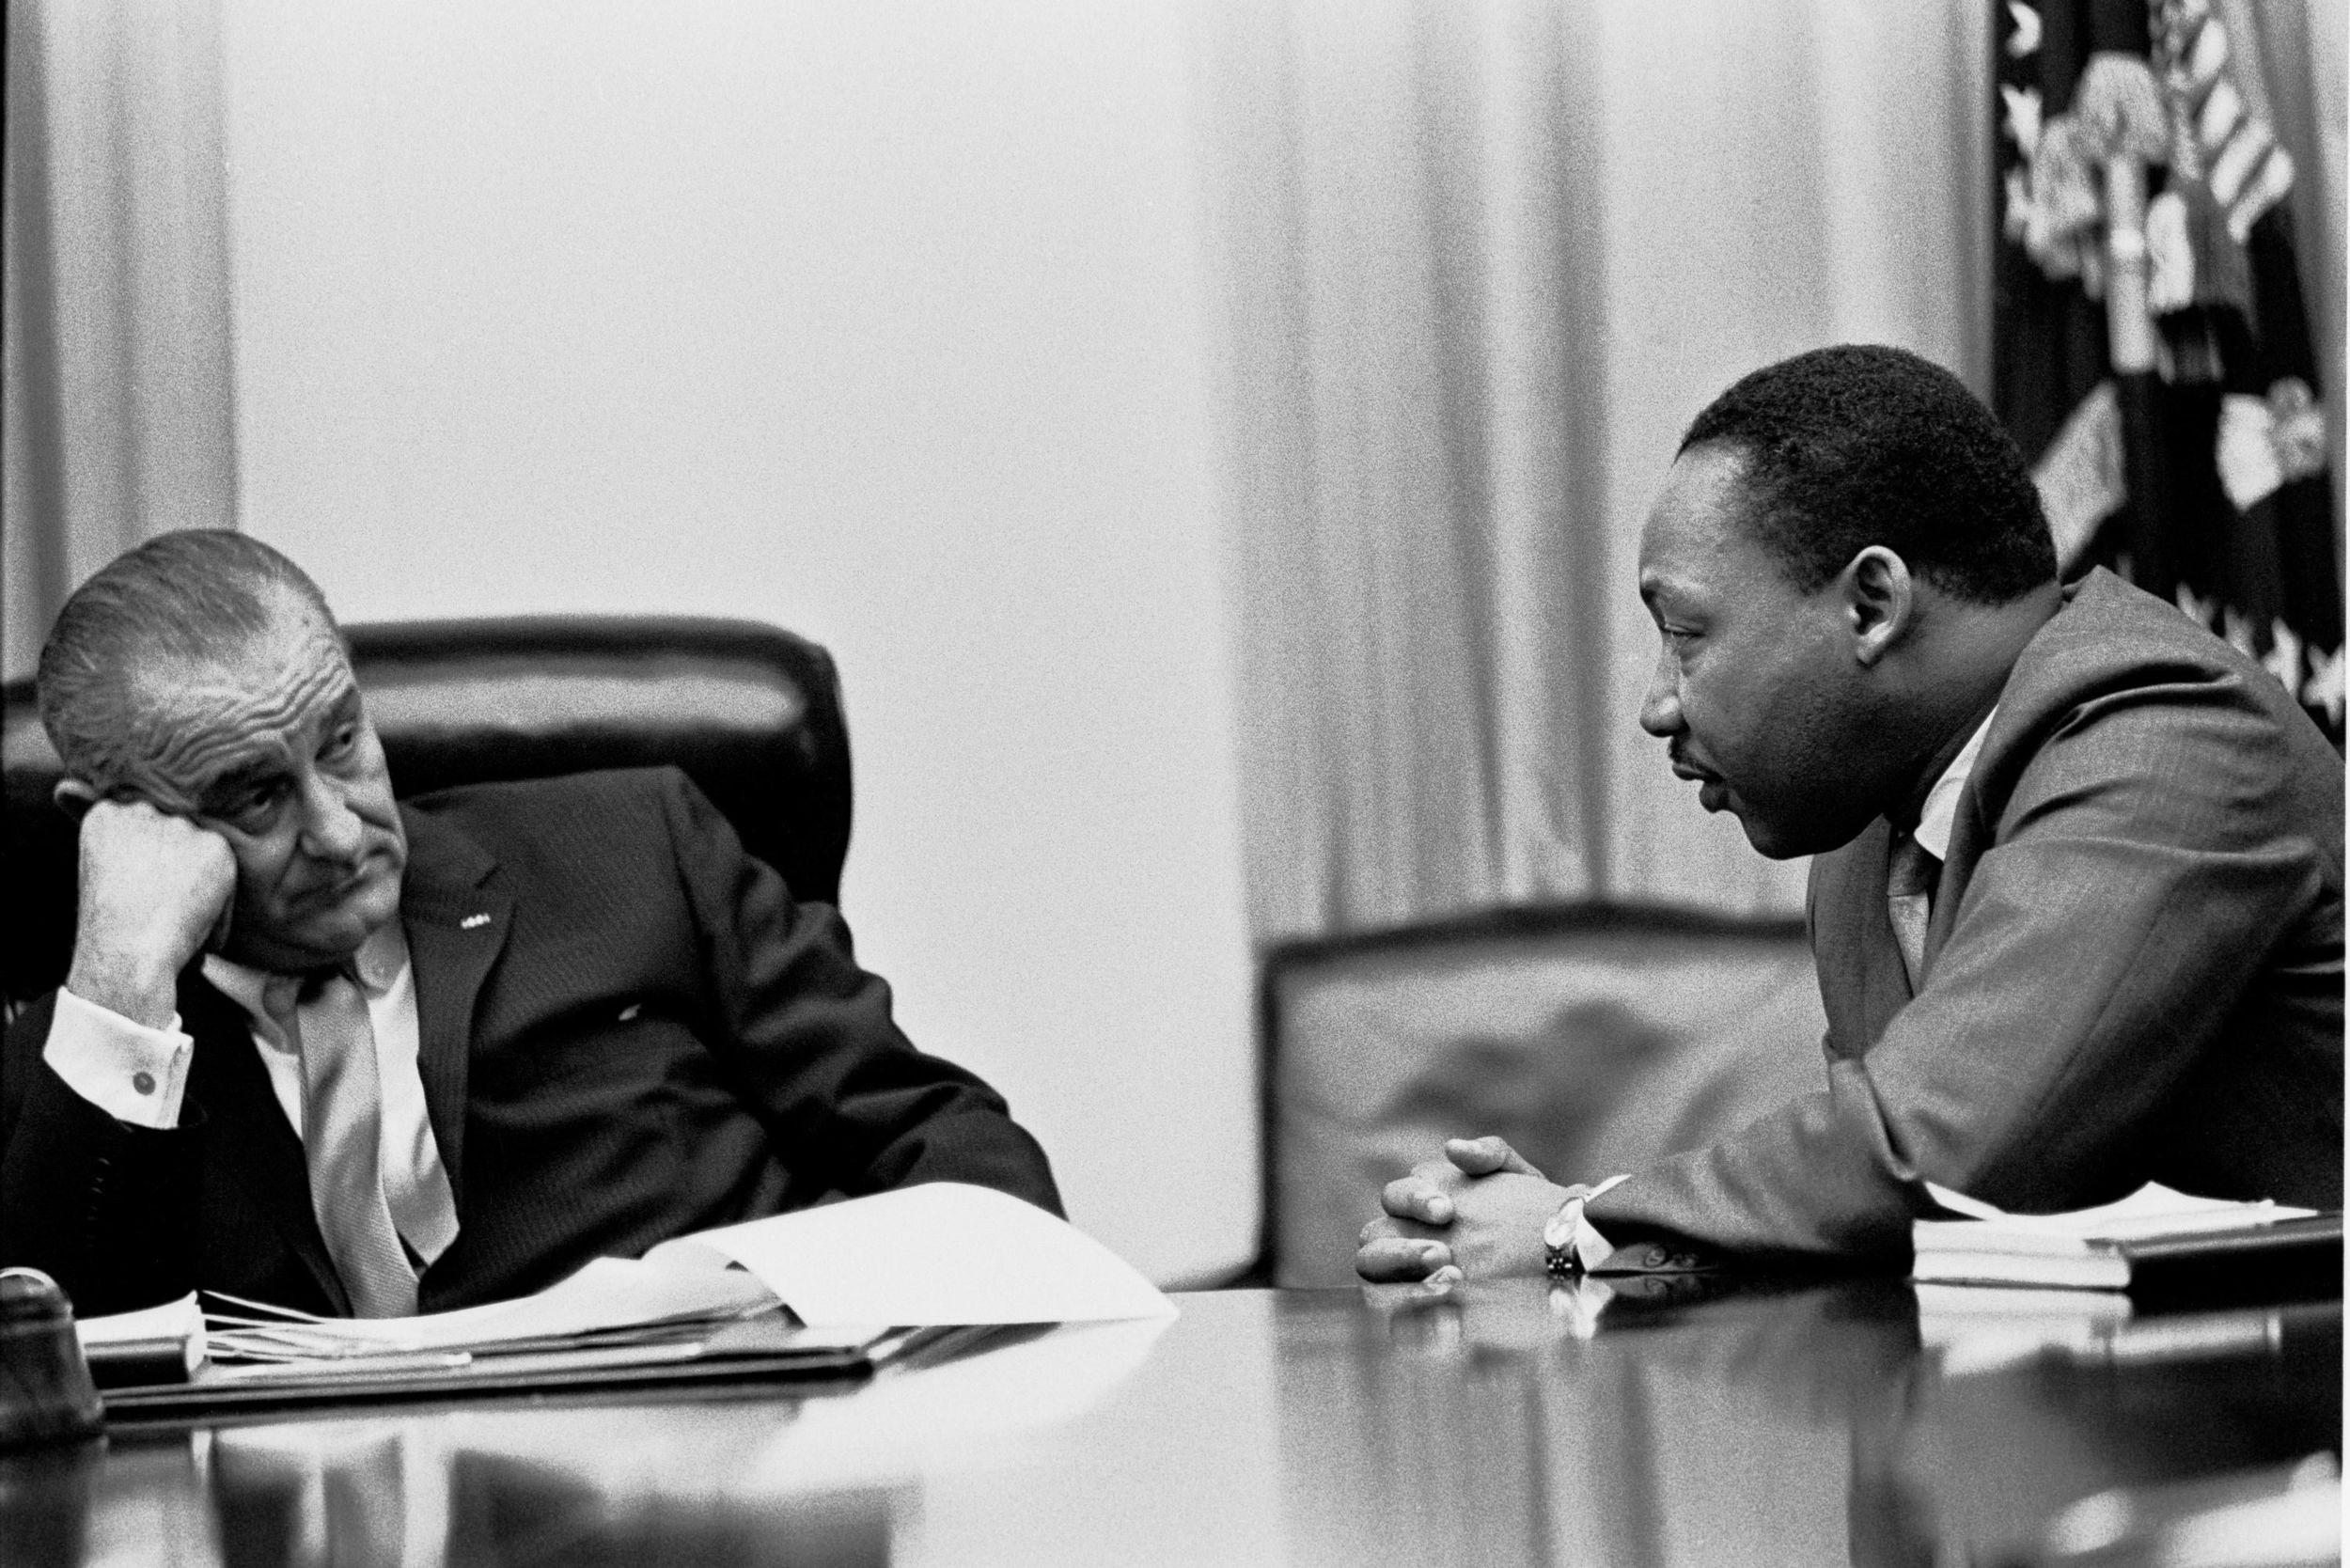 Johnson and King